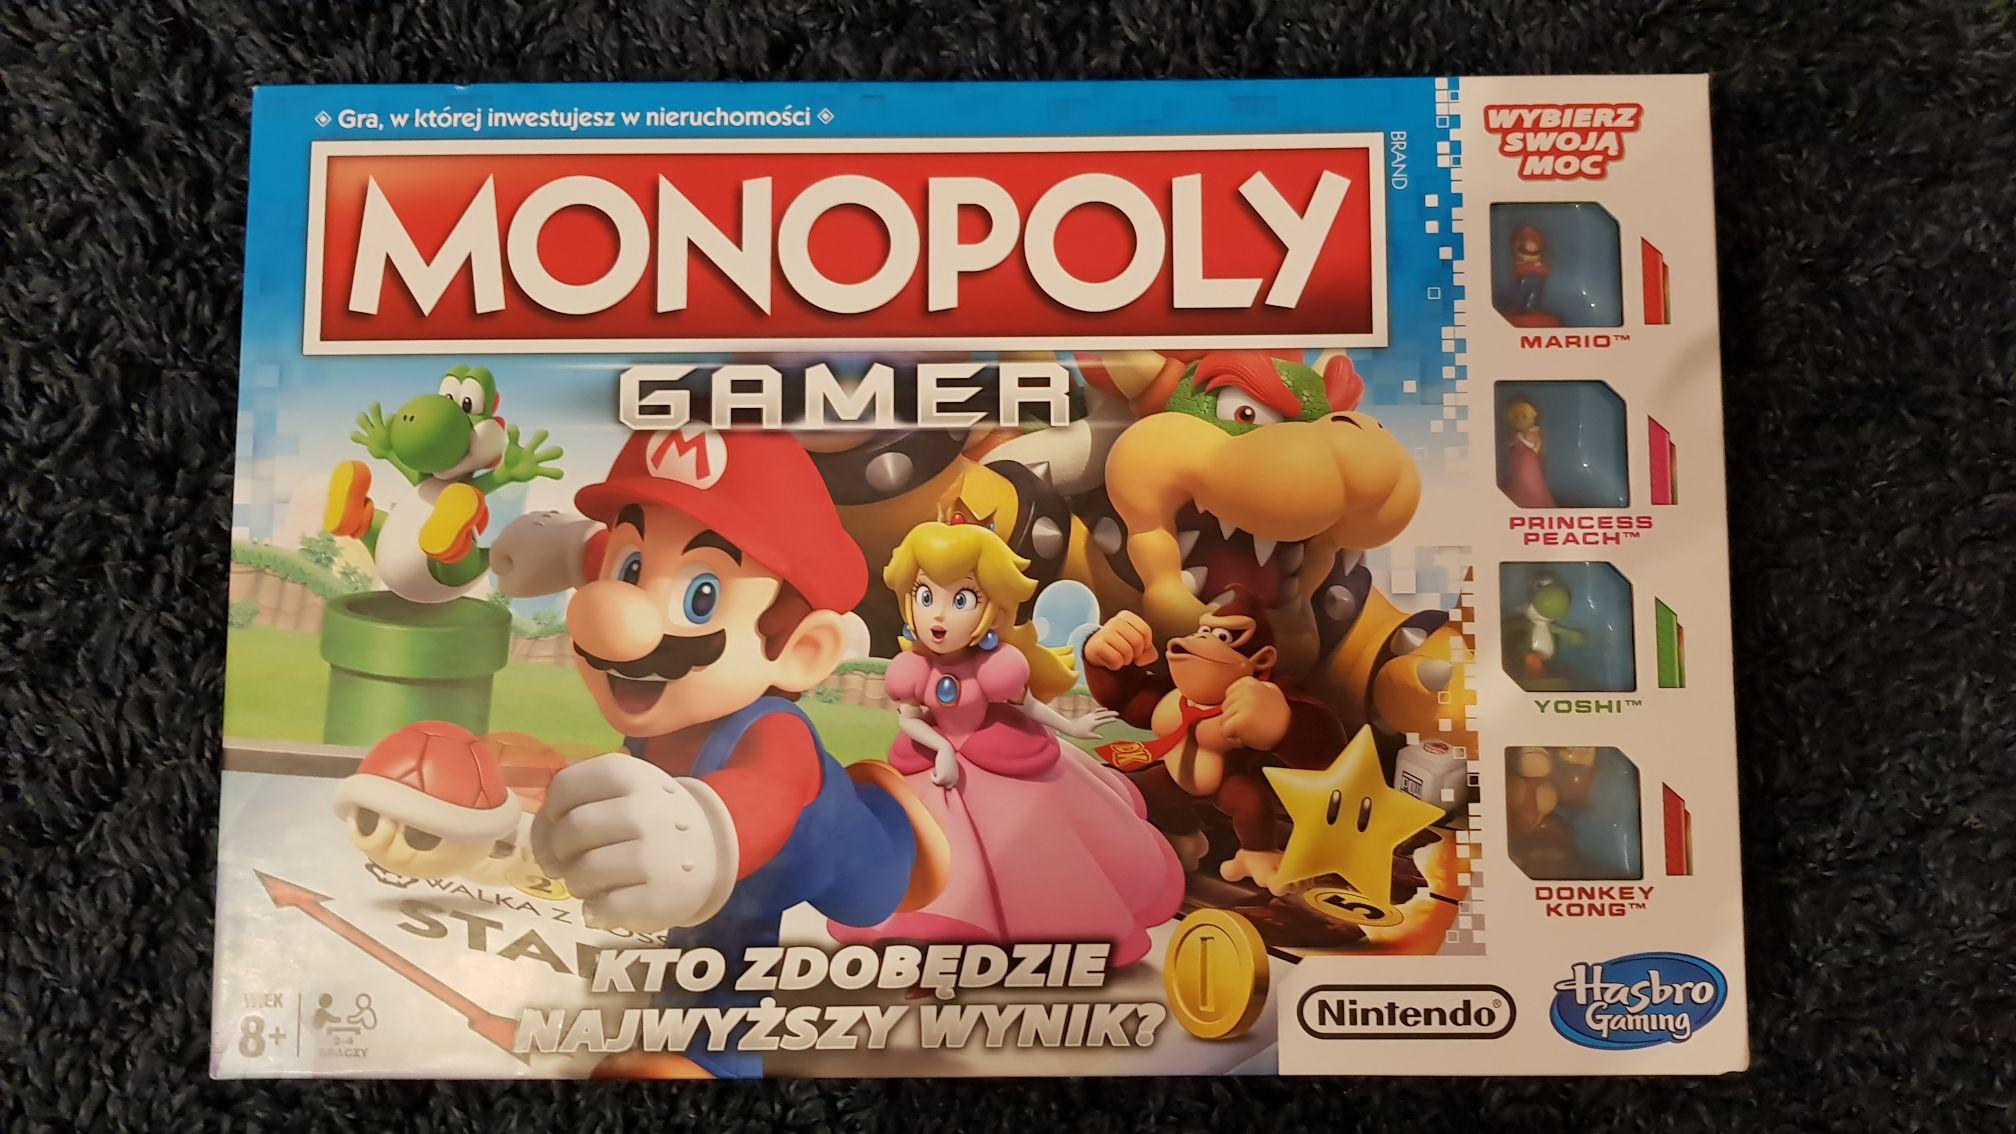 Monopoly Gamer (Nintendo Mario) w Pepco